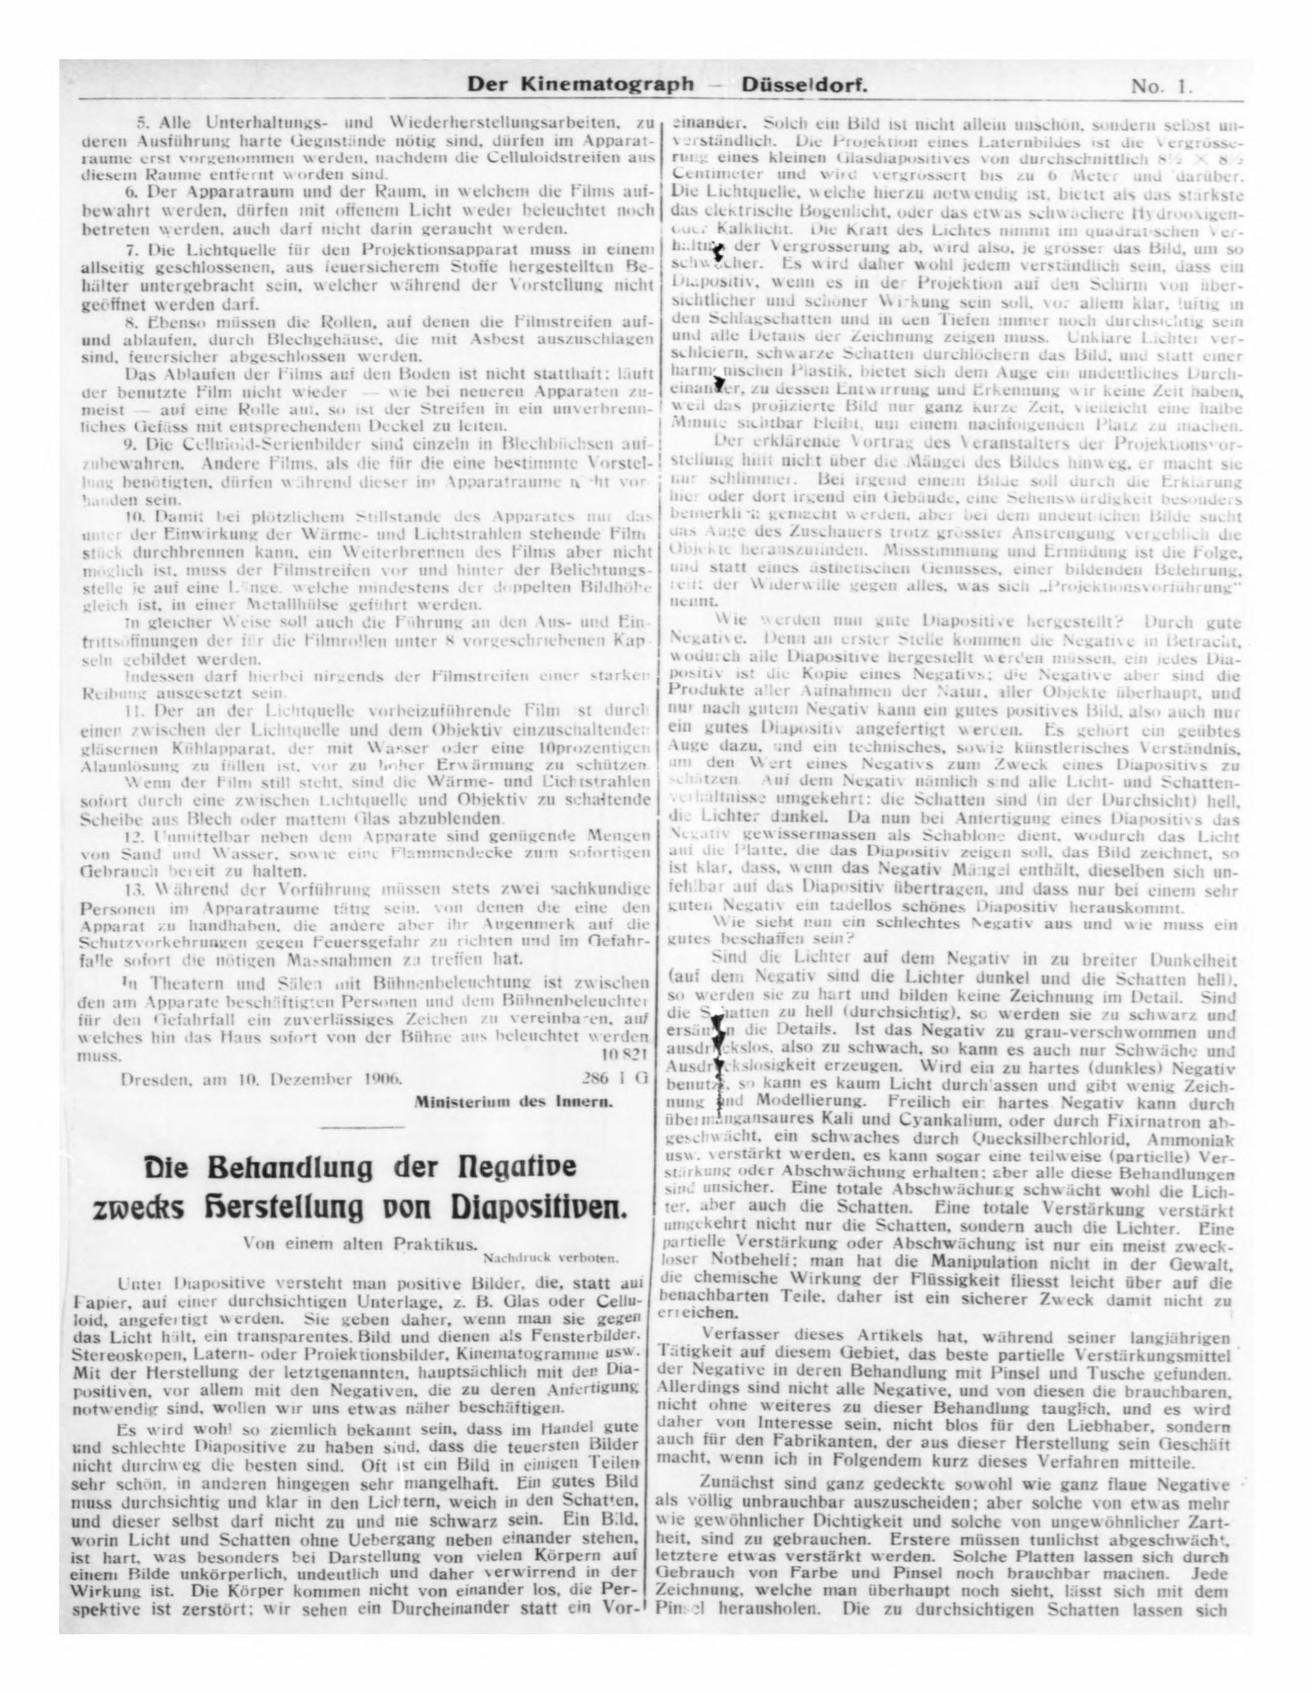 Kinematograph01-1907-01_jp2.zip&file=kinematograph01-1907-01_jp2%2fkinematograph01-1907-01_0004